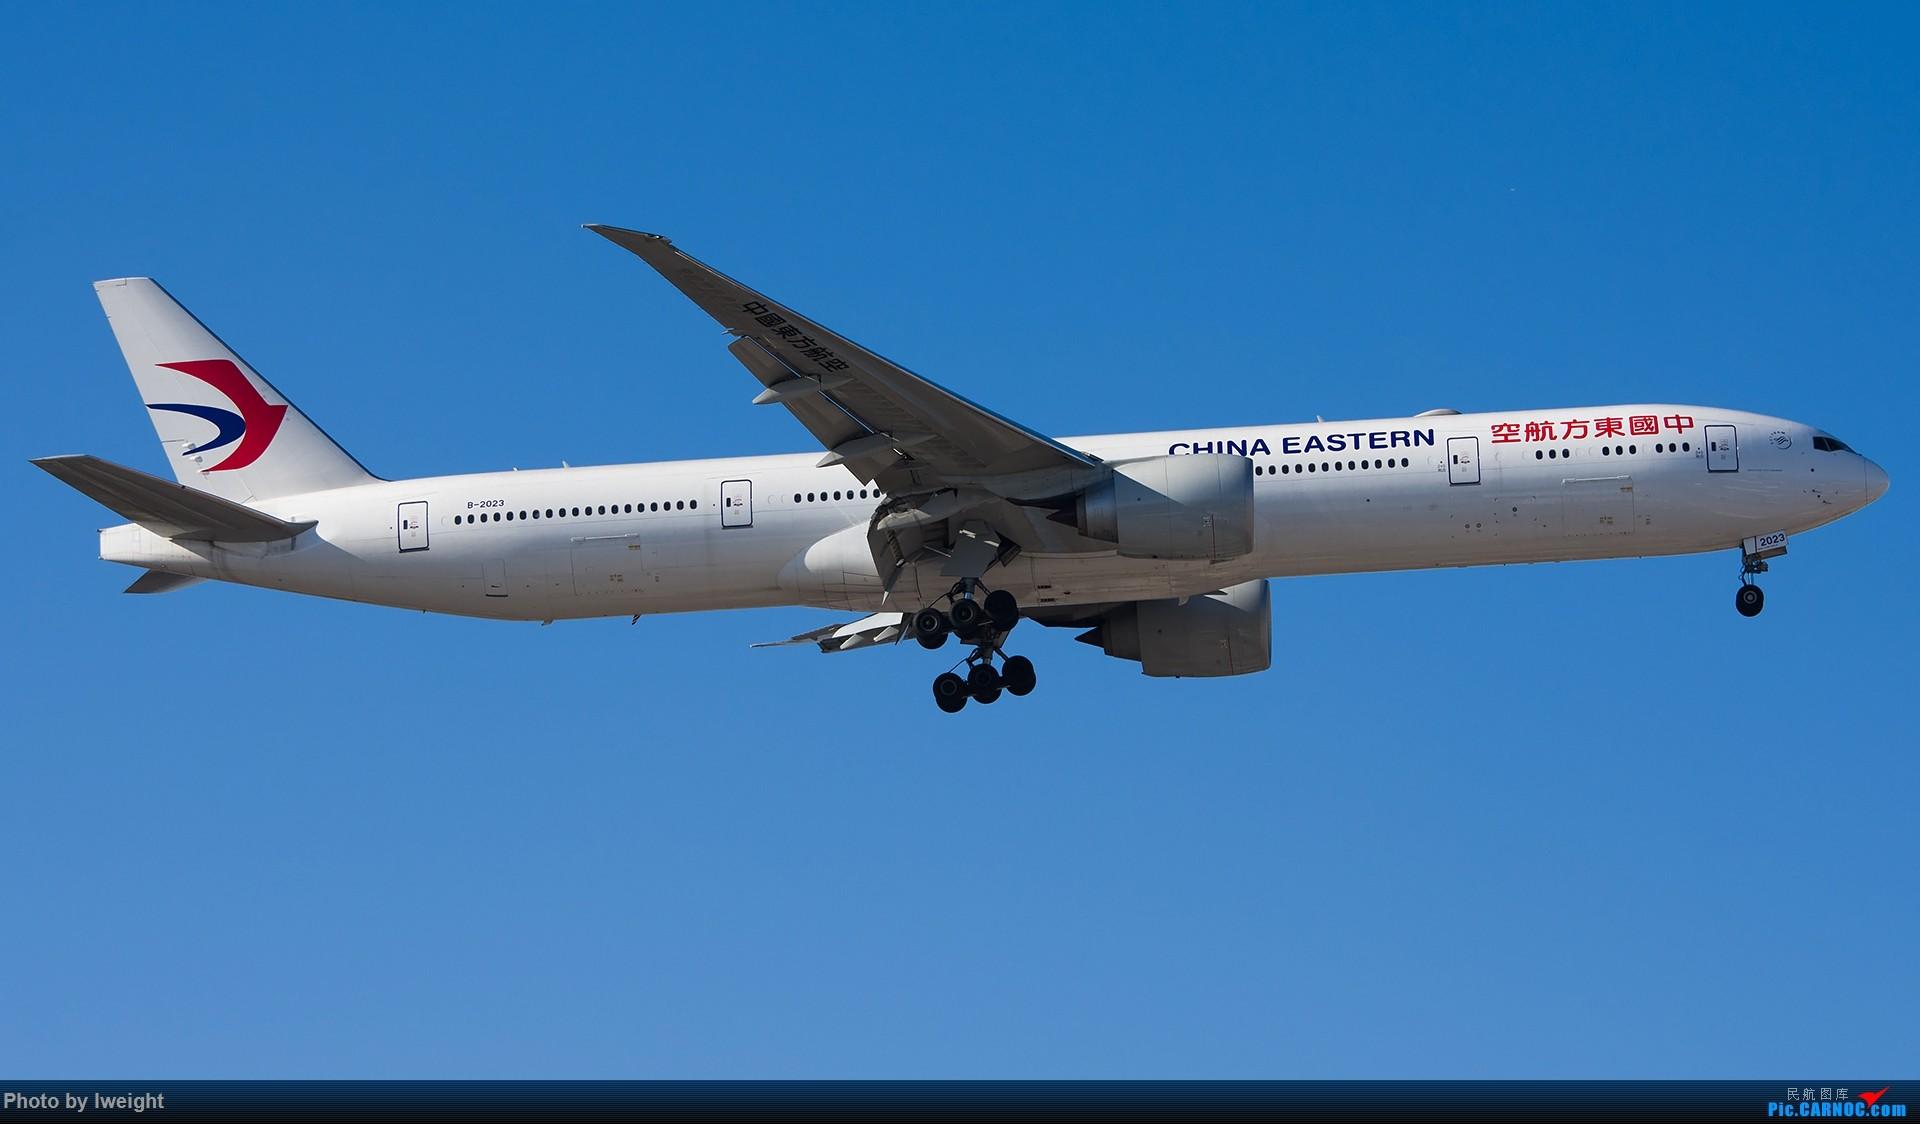 Re:[原创]终于在12月的北京等到了一个晴天的周末,出来拍拍飞机【2015-12-5】 BOEING 777-300ER B-2023 中国北京首都国际机场